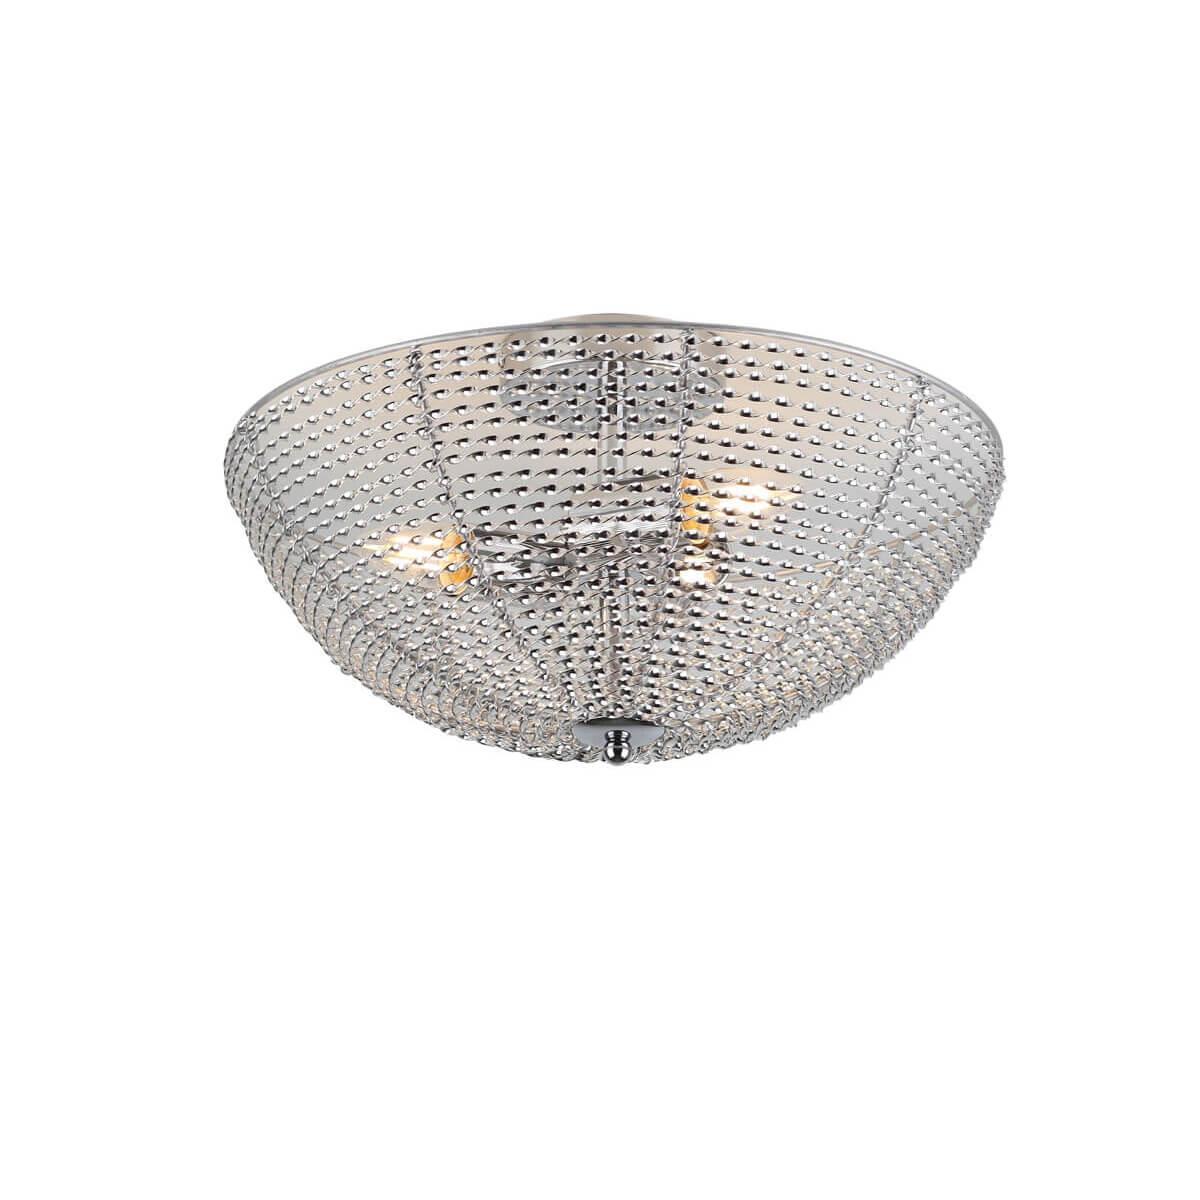 Потолочная люстра Rivoli Spiedo 4010-103 цены онлайн